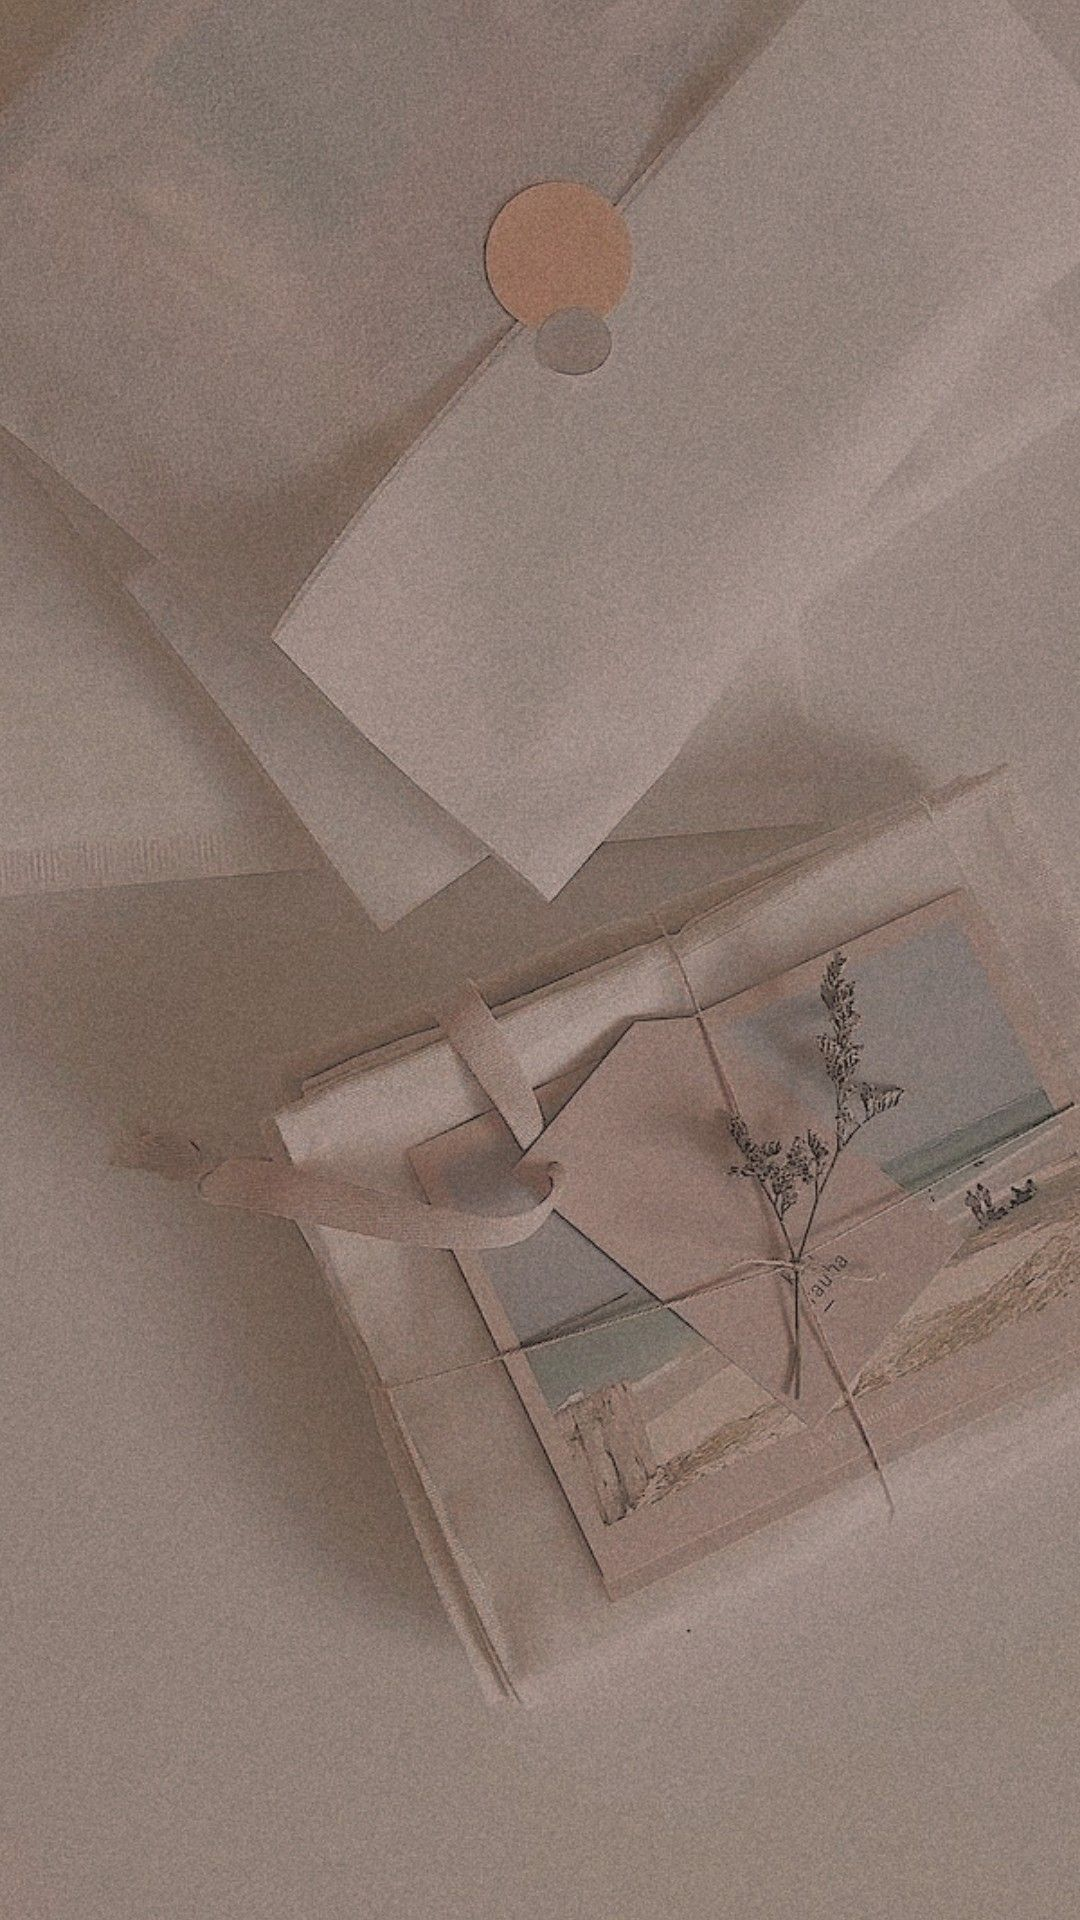 ˏˋ Pintereѕt Sstarstuff ˊˎ Aestheticflowers Aesthetic Wallpapers Aesthetic Pastel Wallpaper Pastel Aesthetic